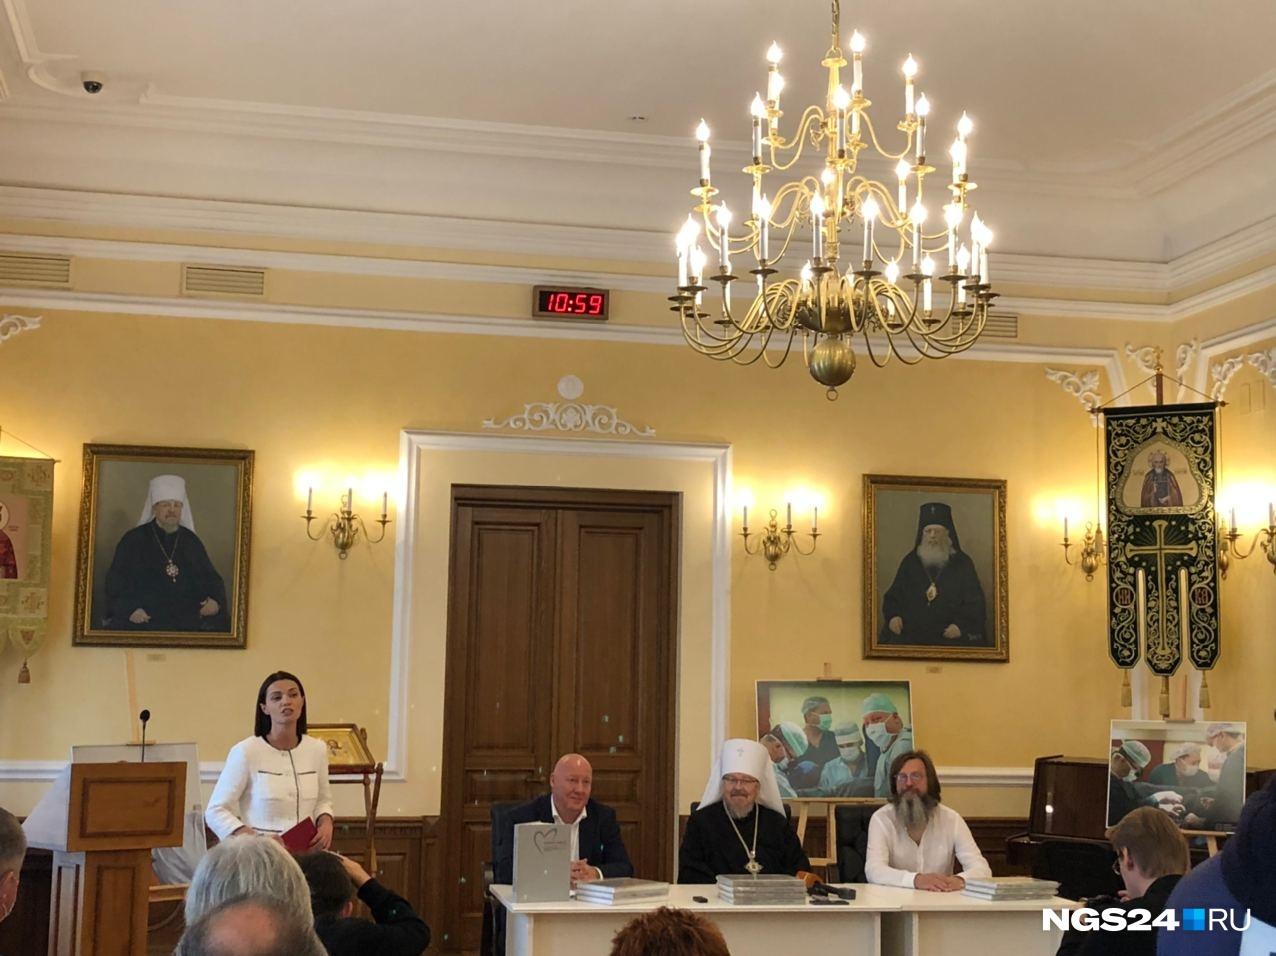 Книгу презентовали в Архиерейском доме. Справа — Алексей Снетков, слева — Валерий Сакович